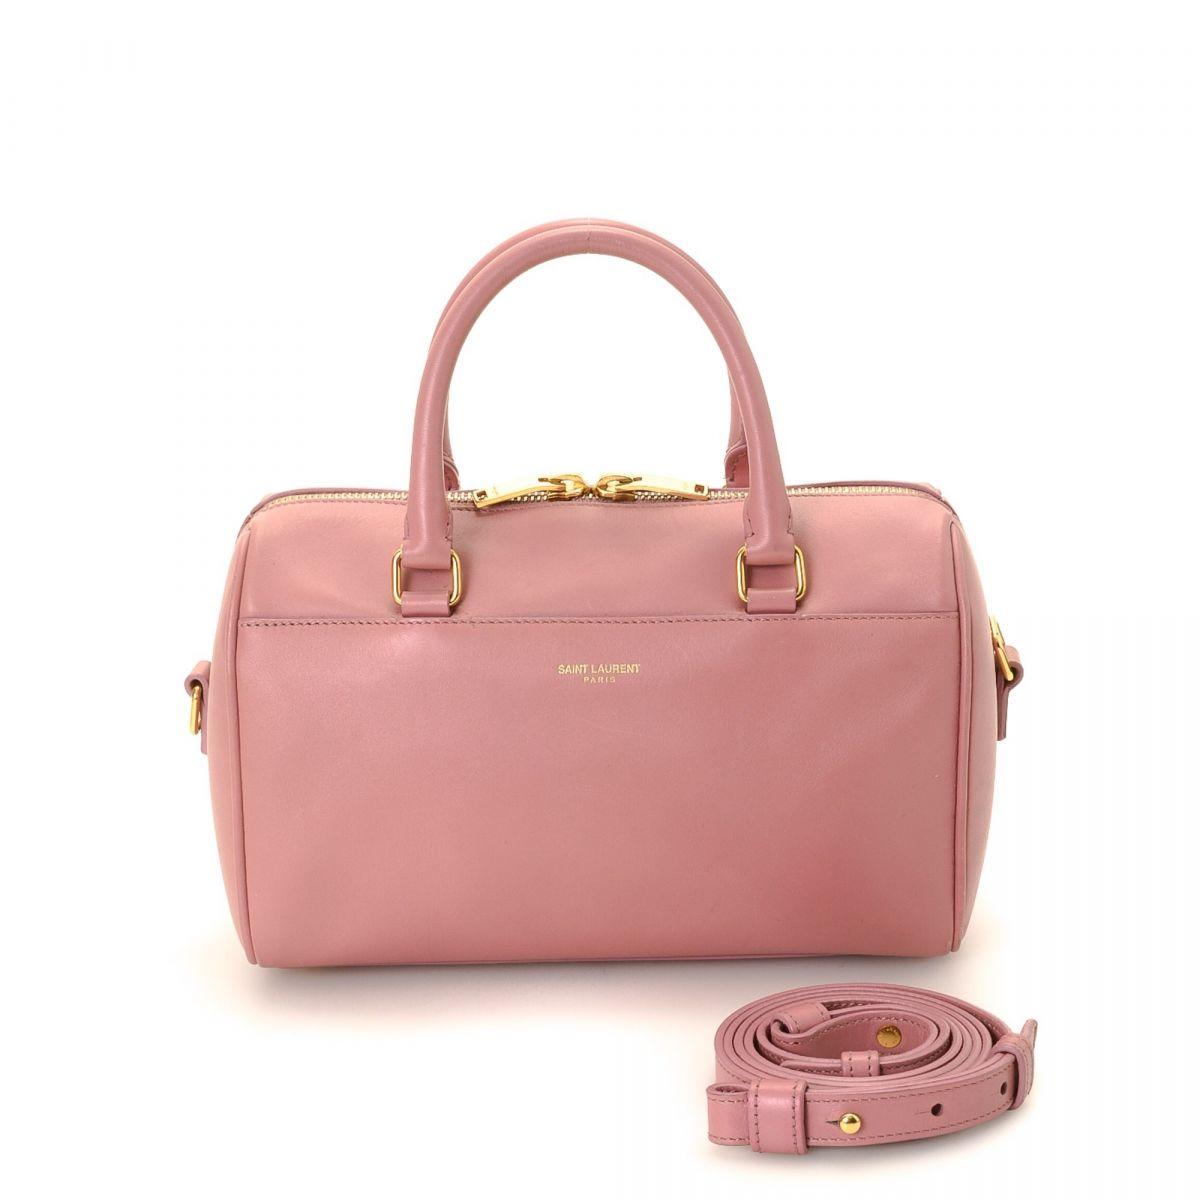 Ysl Muse Bag | Handbag Yves Saint Laurent | Yves Saint Laurent Handbags